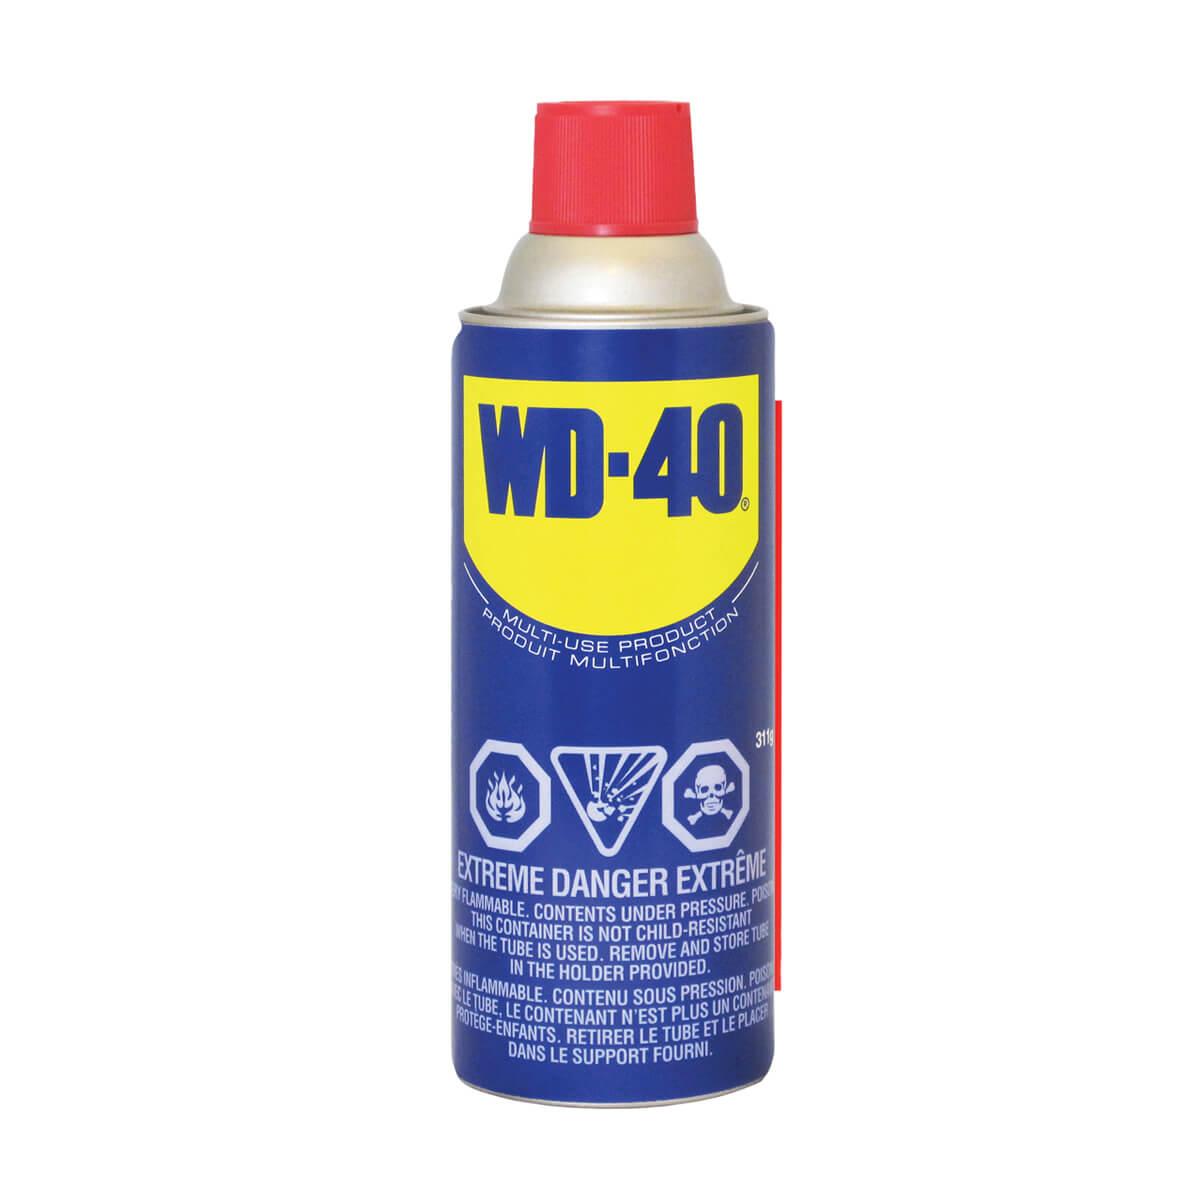 WD-40 Multi-Use Lube Oil - 311 g